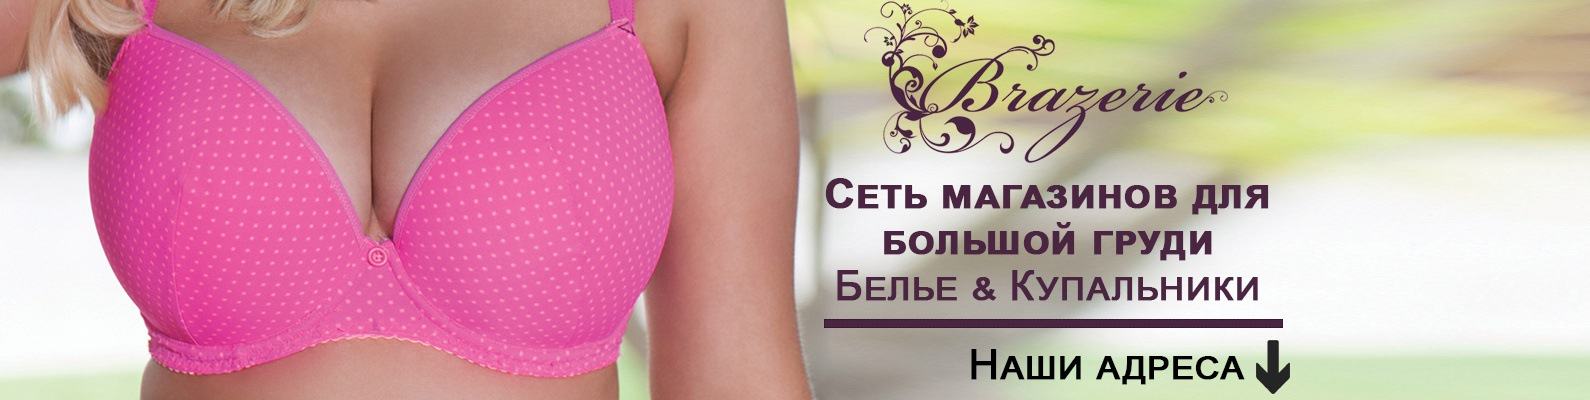 bolshie-siski-ukraini-vkontakte